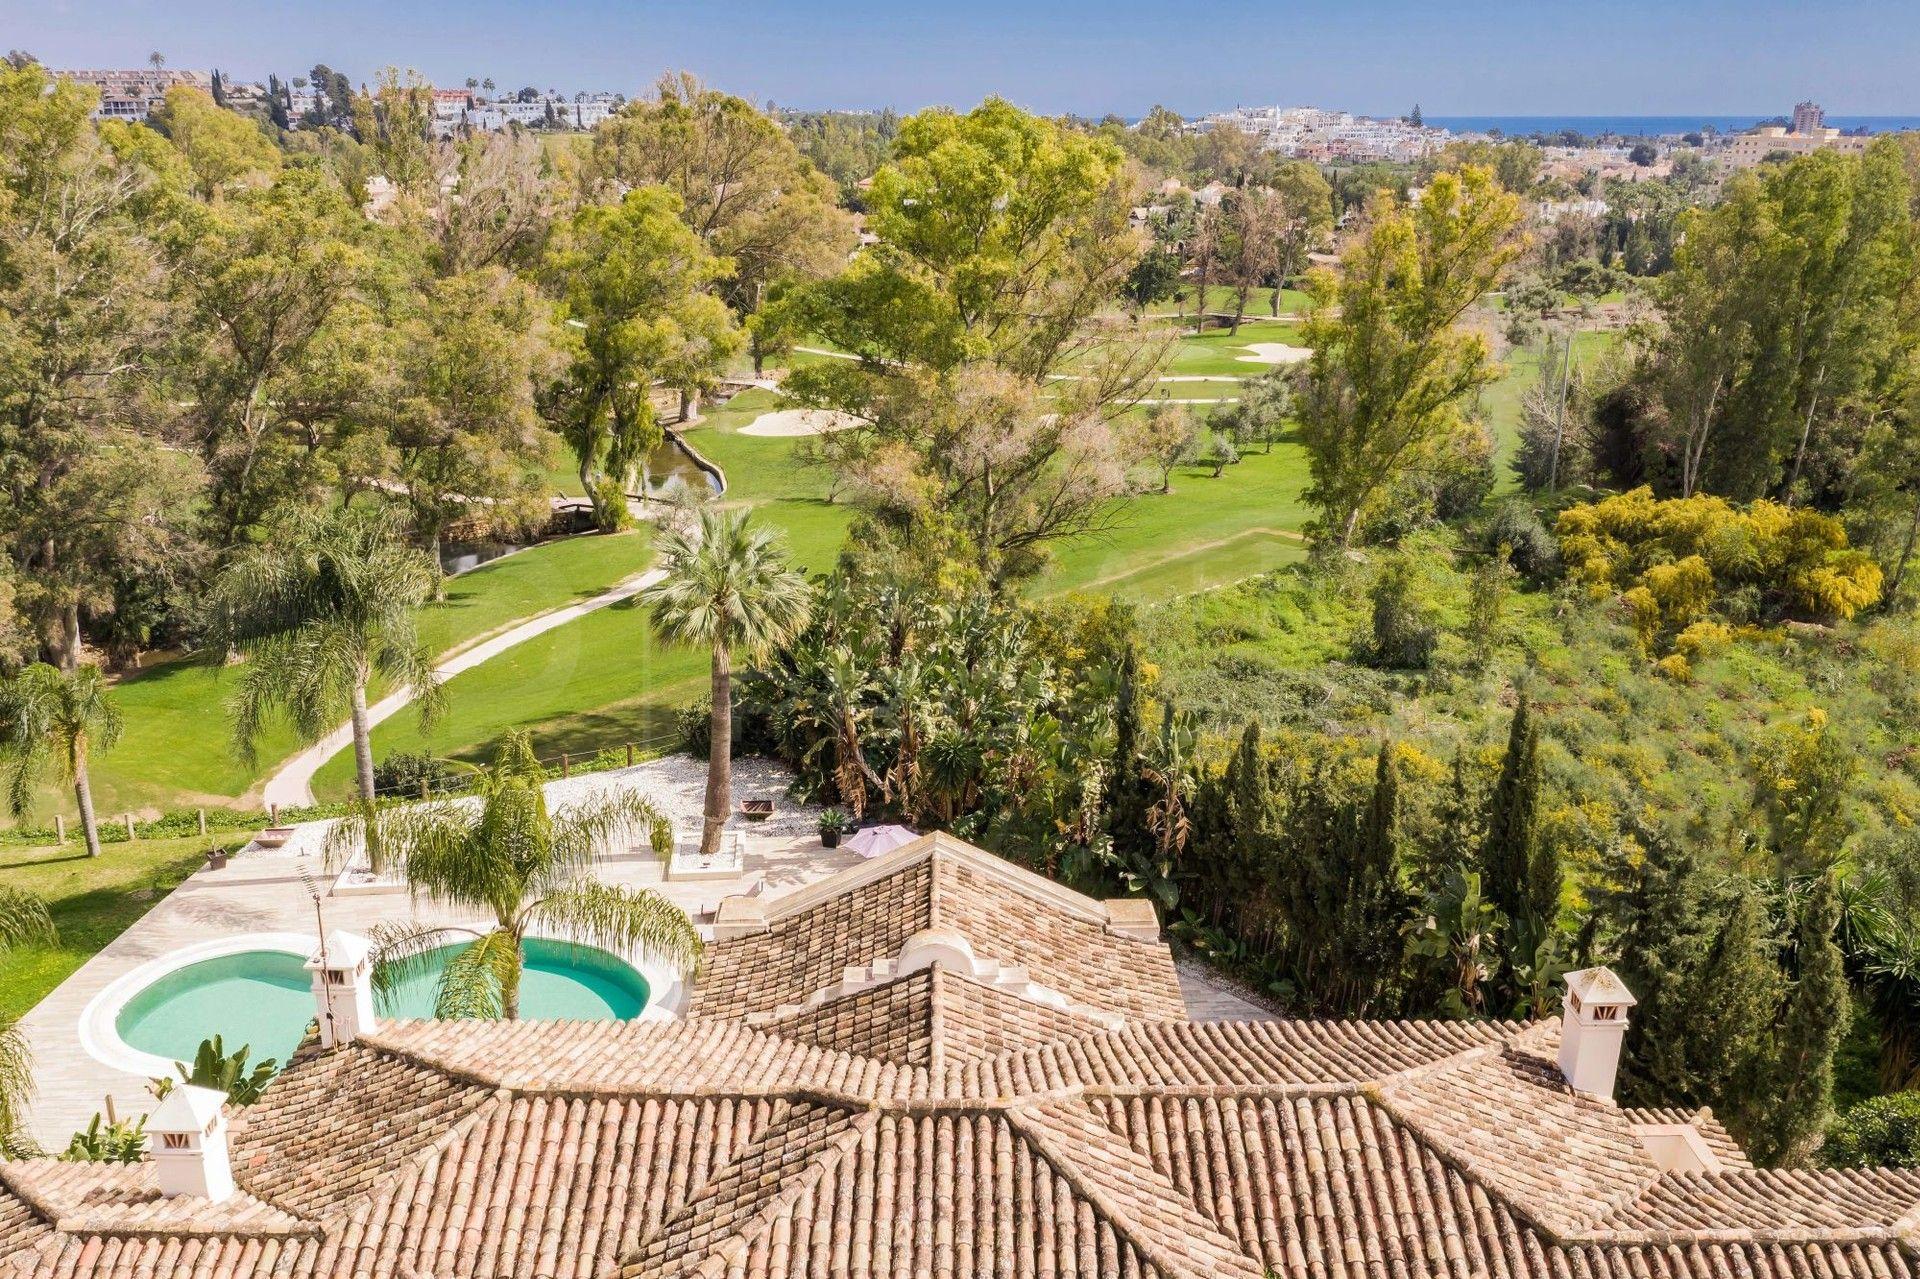 Frontline golf villa in La Cerquilla